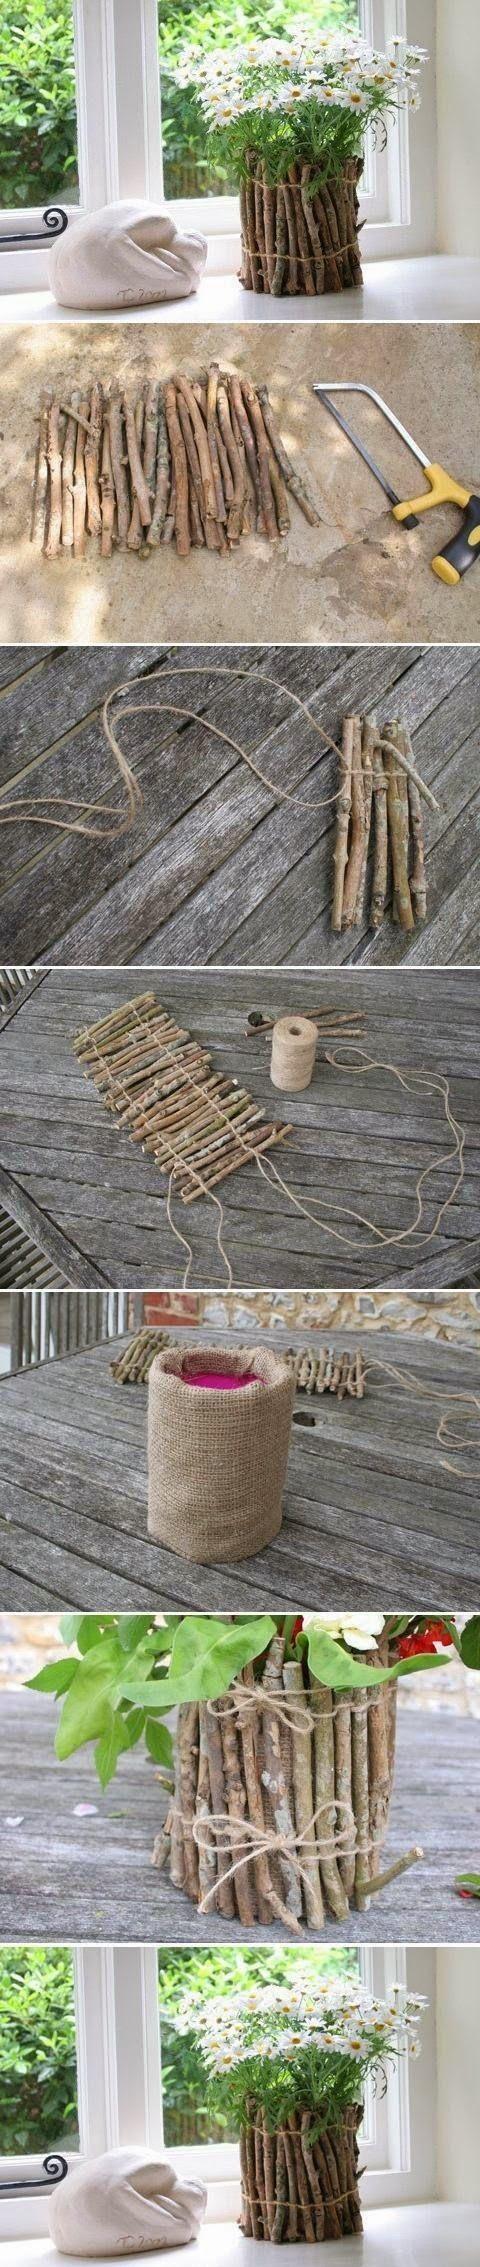 DIY: Tree Branches Flower Pot | DIY & amp; Crafts Tutorials